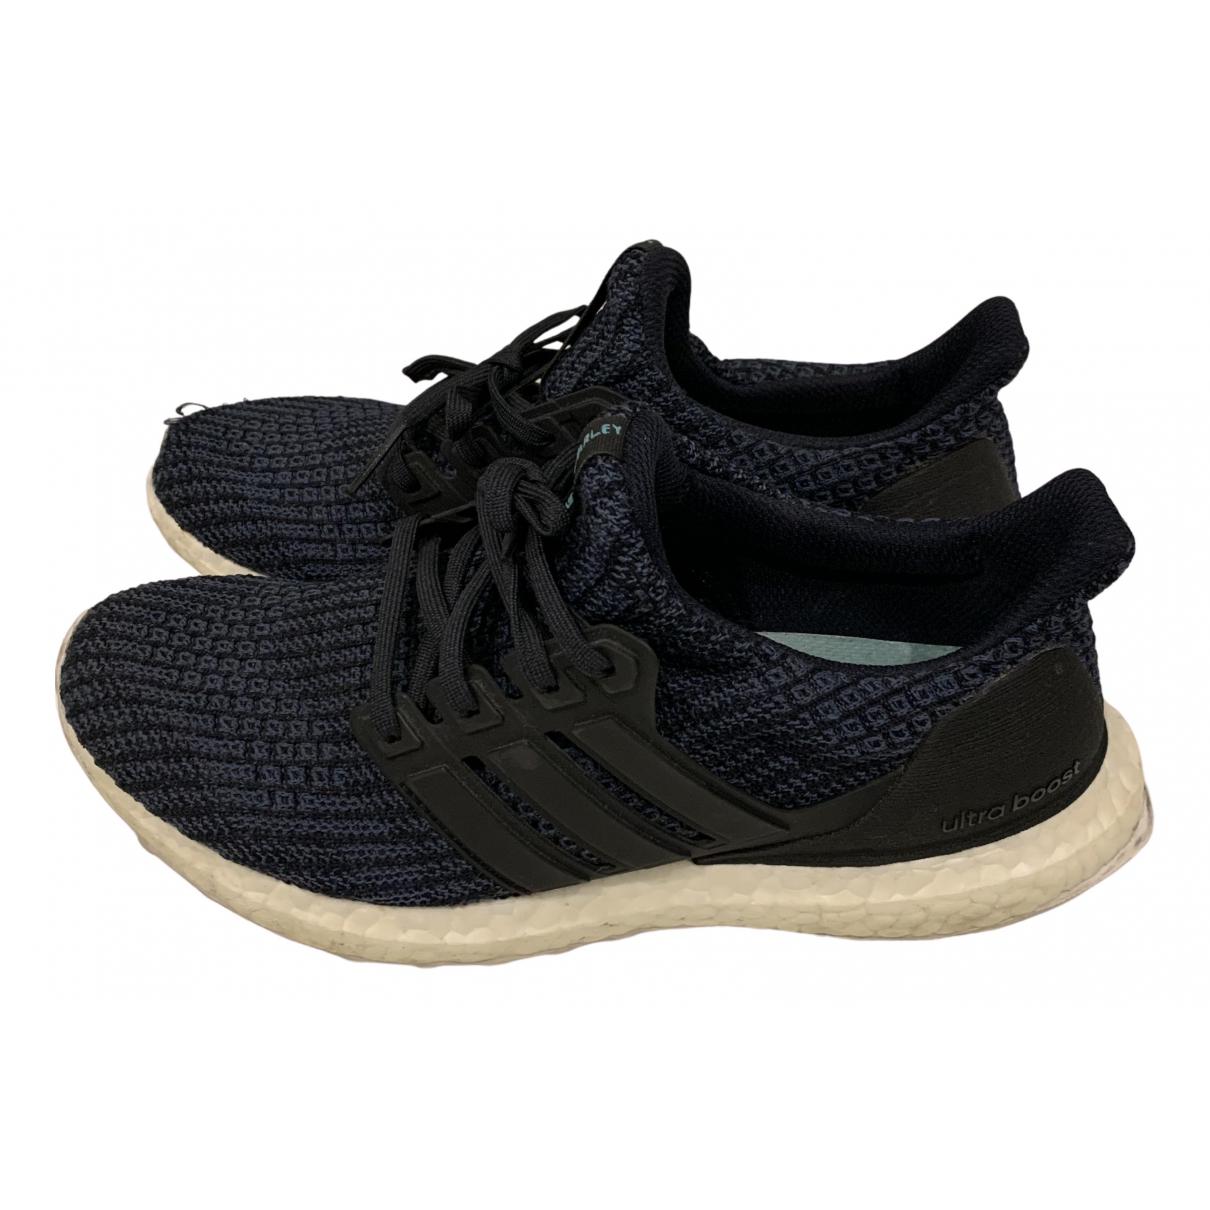 Adidas - Baskets Ultraboost pour femme en toile - marine